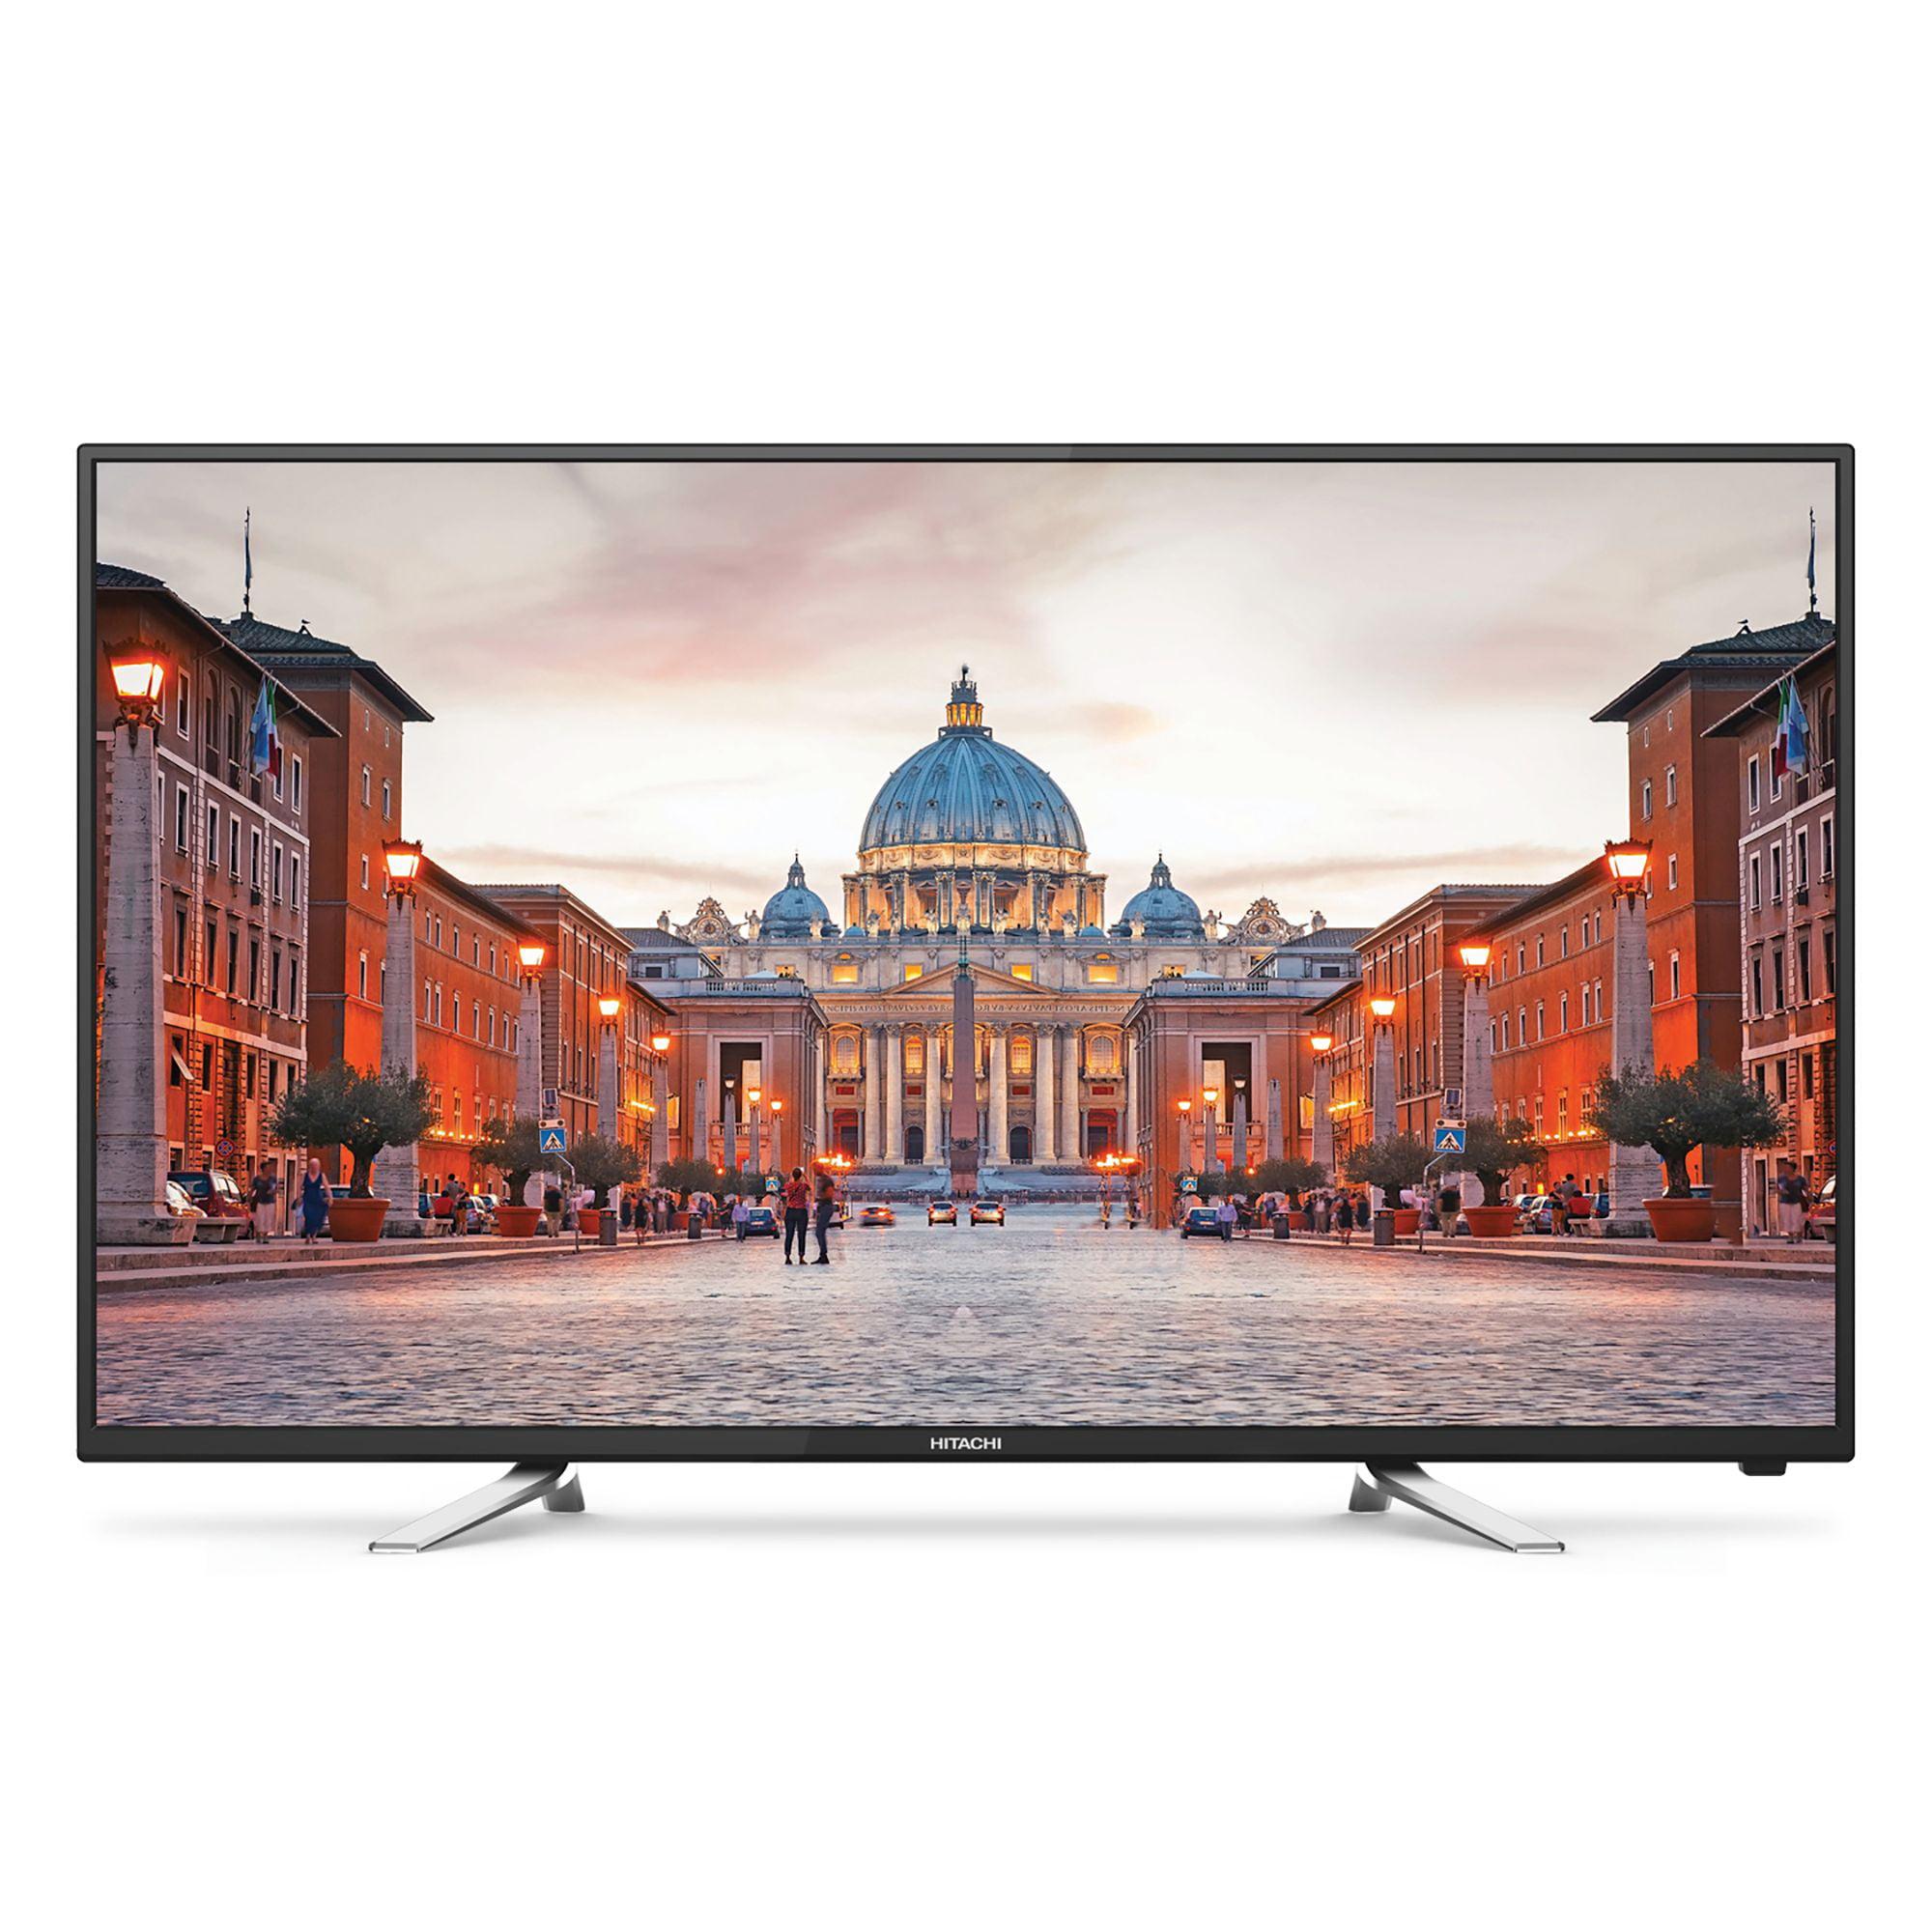 "Refurbished Hitachi 50"" Class 4K (2160P) LED TV (50C60) by Hitachi"